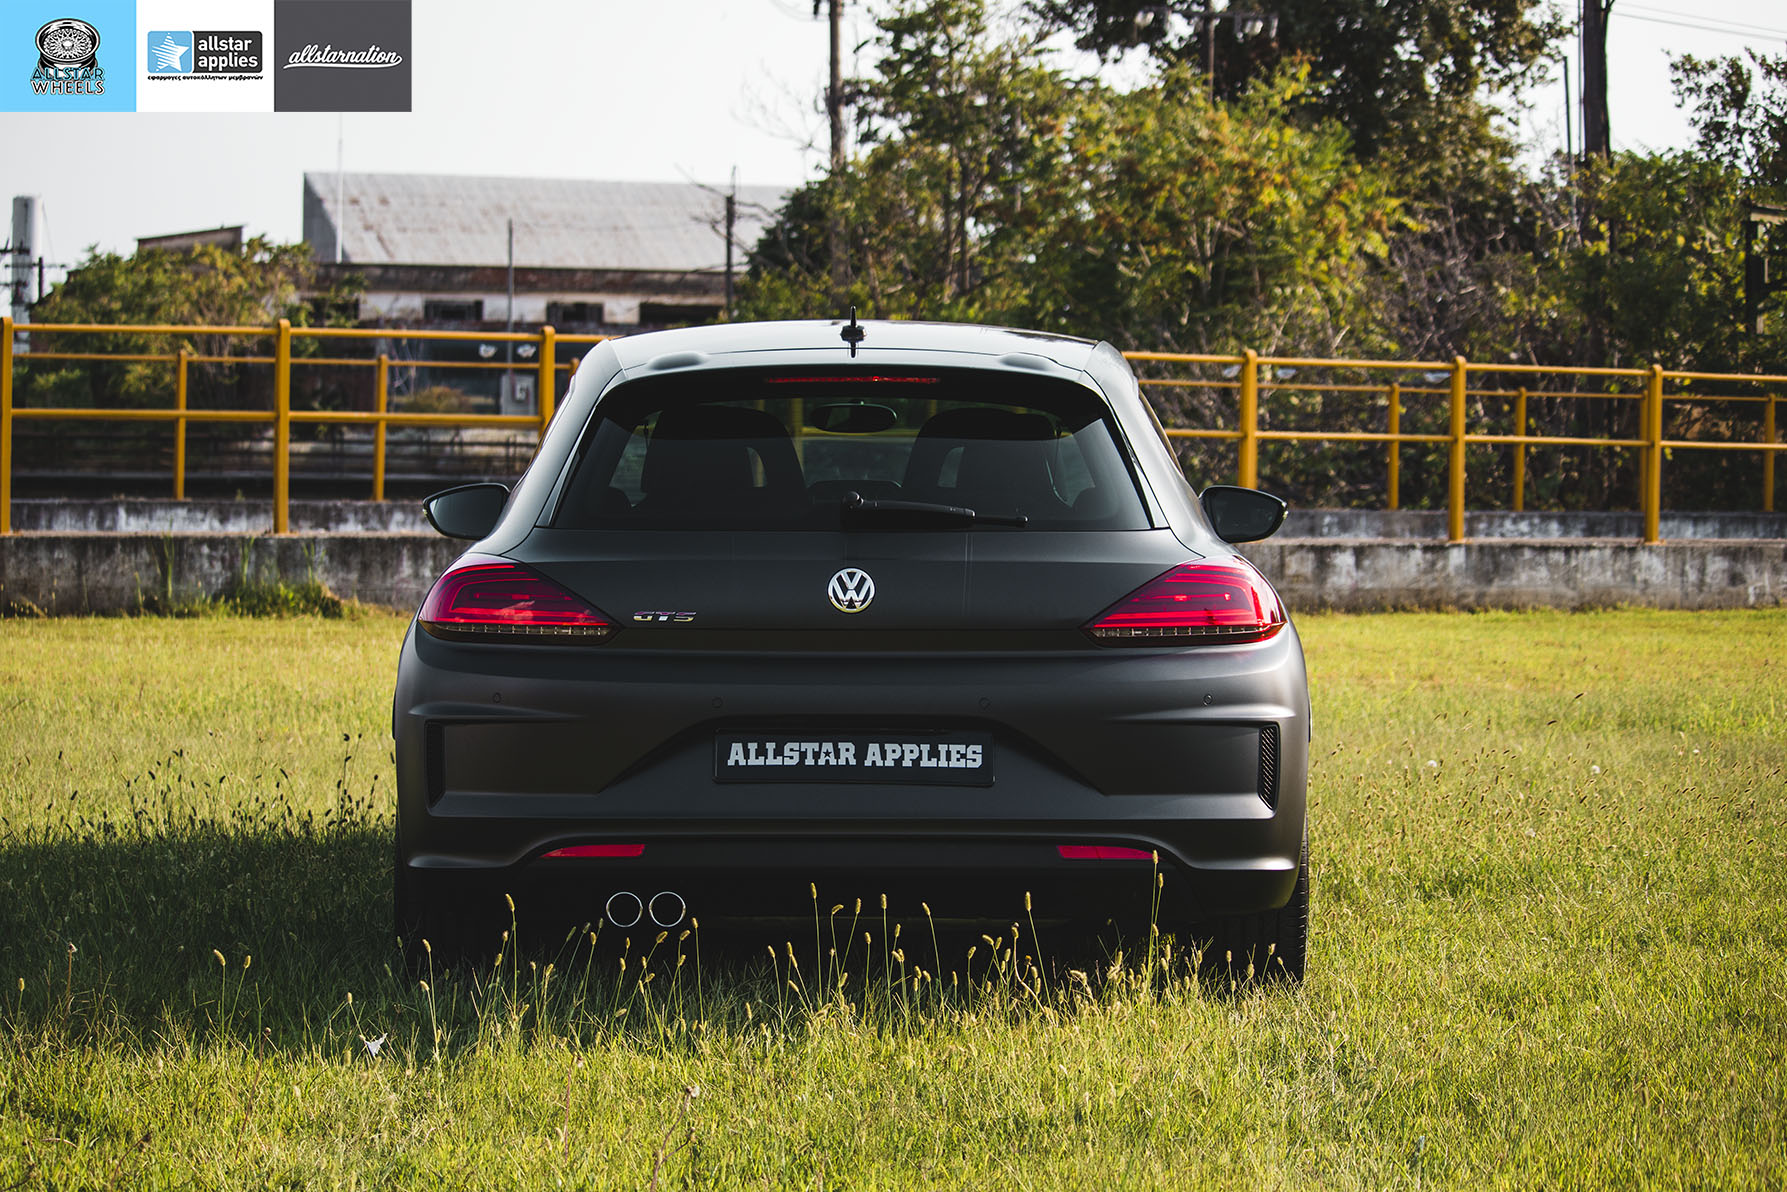 VW SCIROCCO MATT DIAMOND BLACK ALLSTAR APPLIES (8)